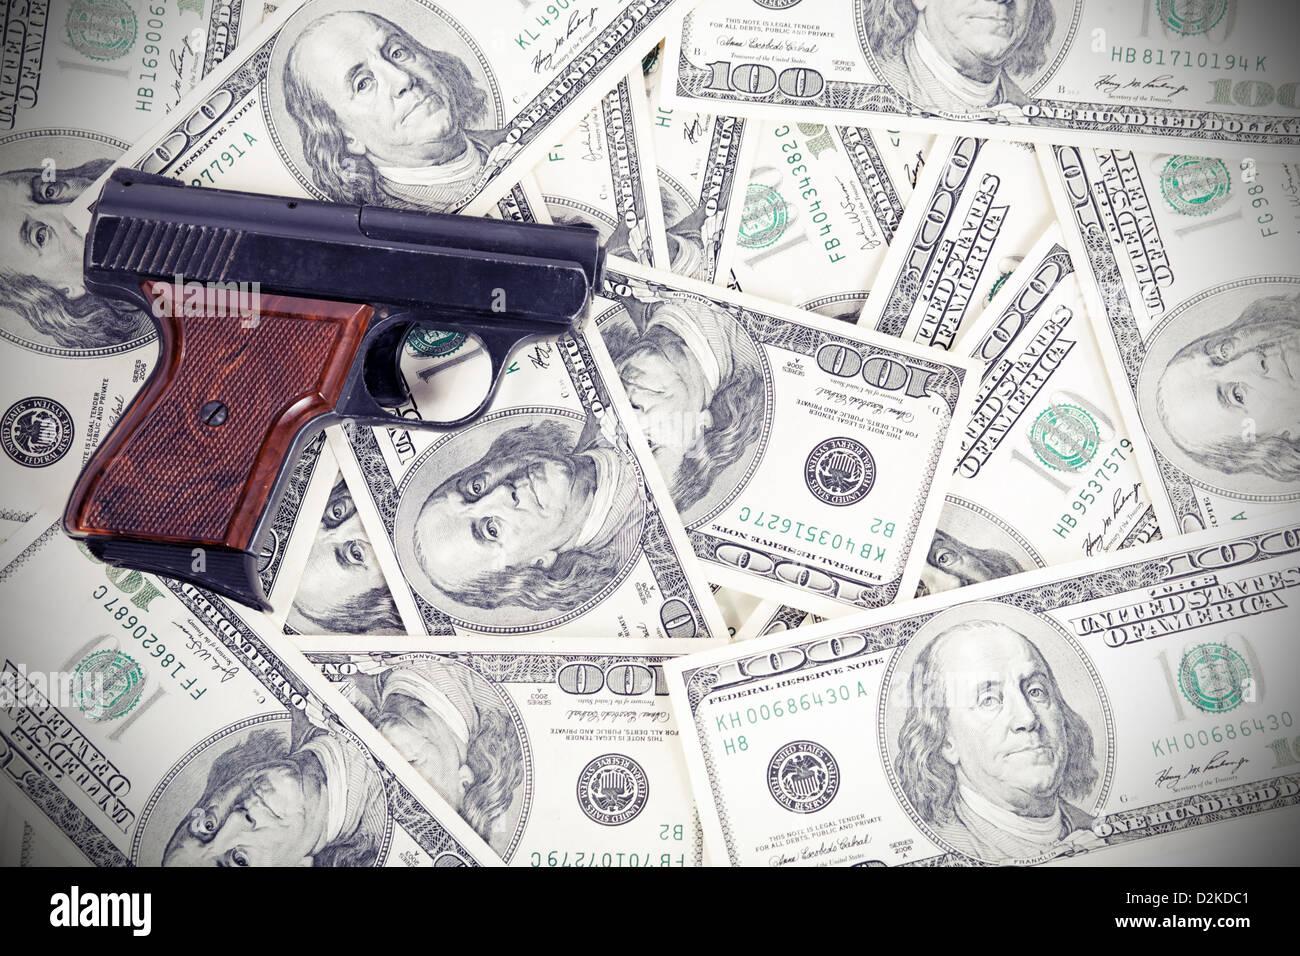 a gun lying on the criminal-earned money - Stock Image